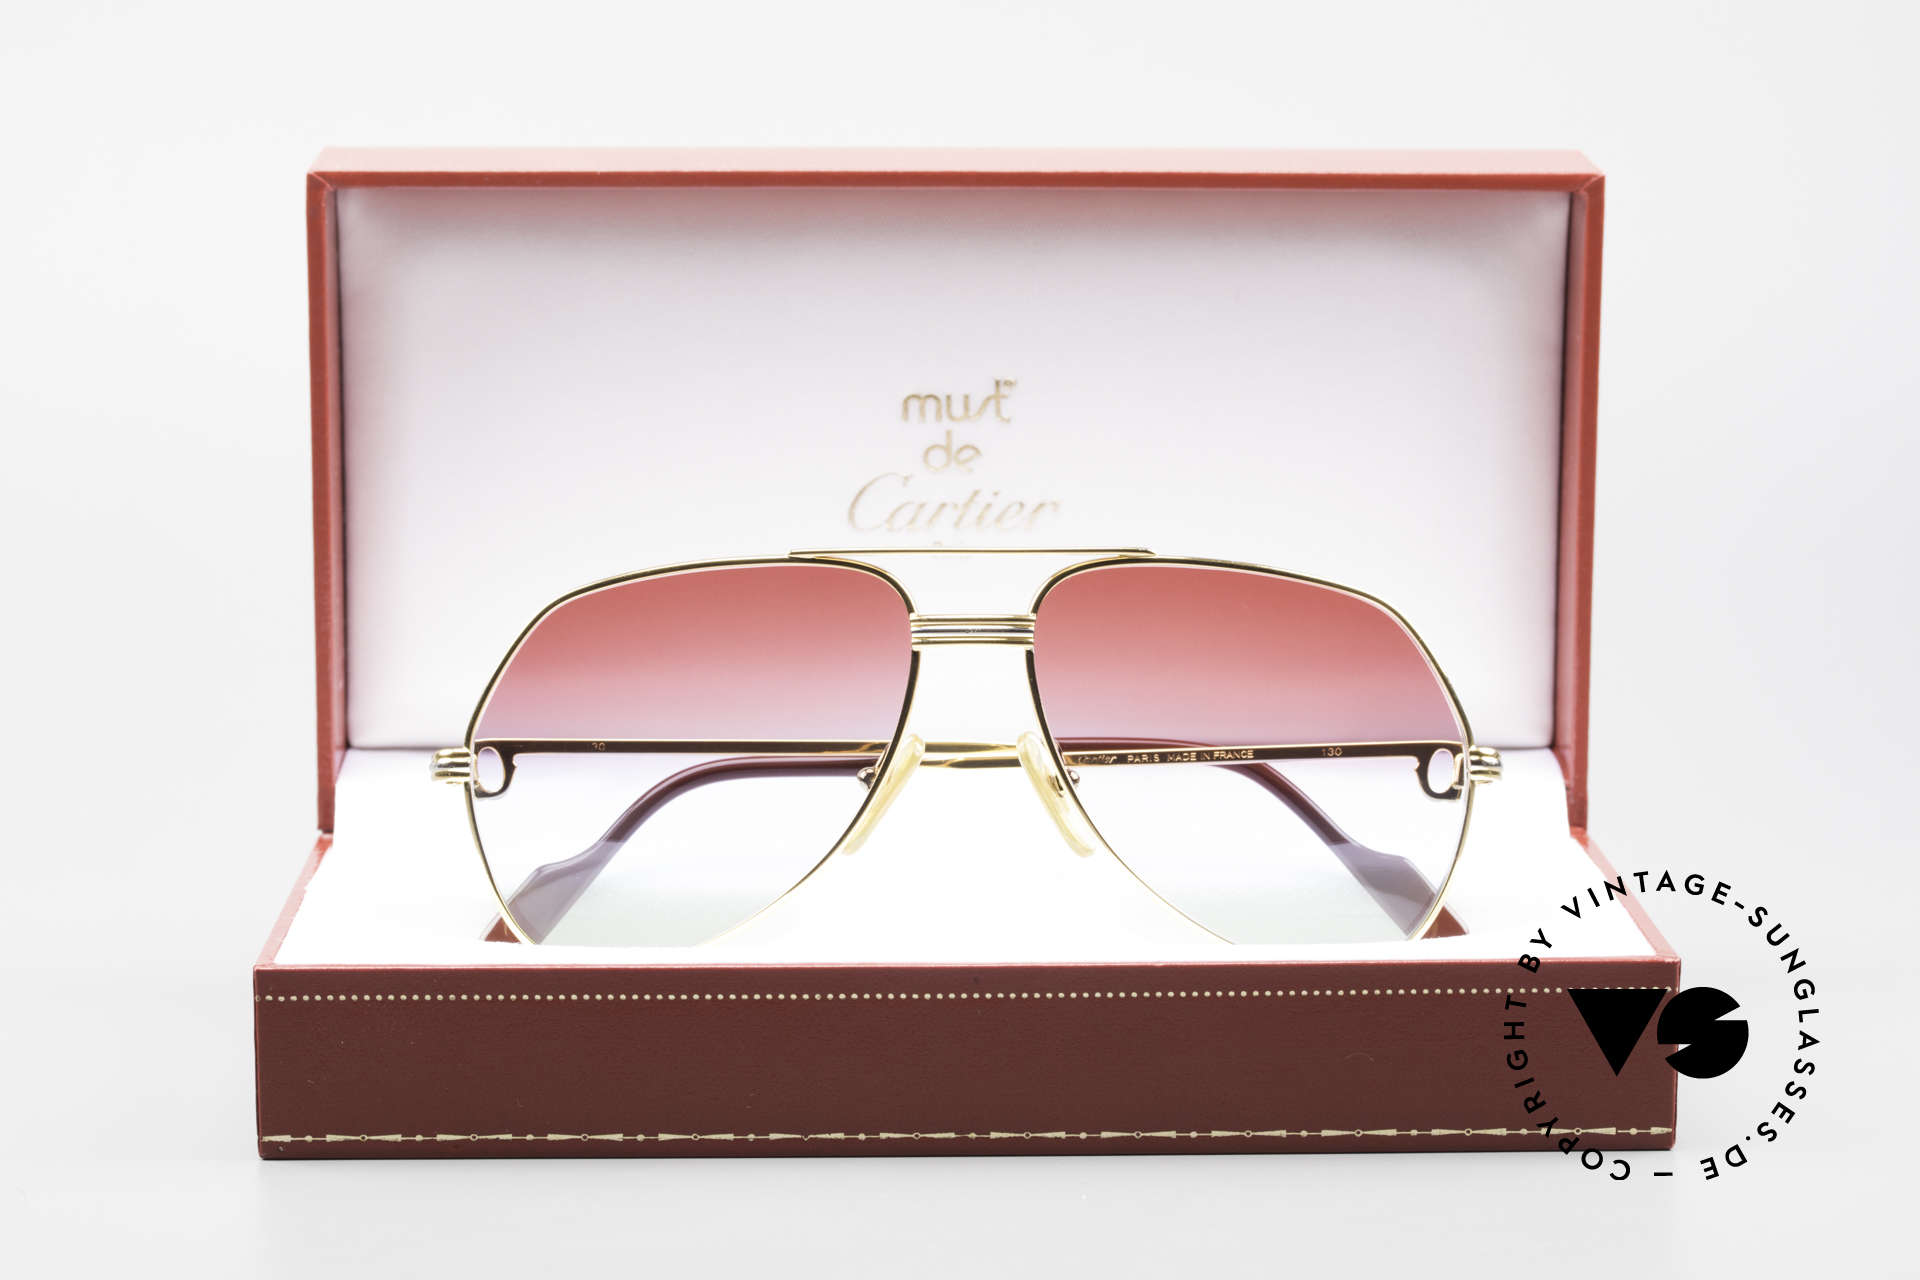 Cartier Vendome LC - S 1980's Sunglasses Tricolored, Size: medium, Made for Men and Women